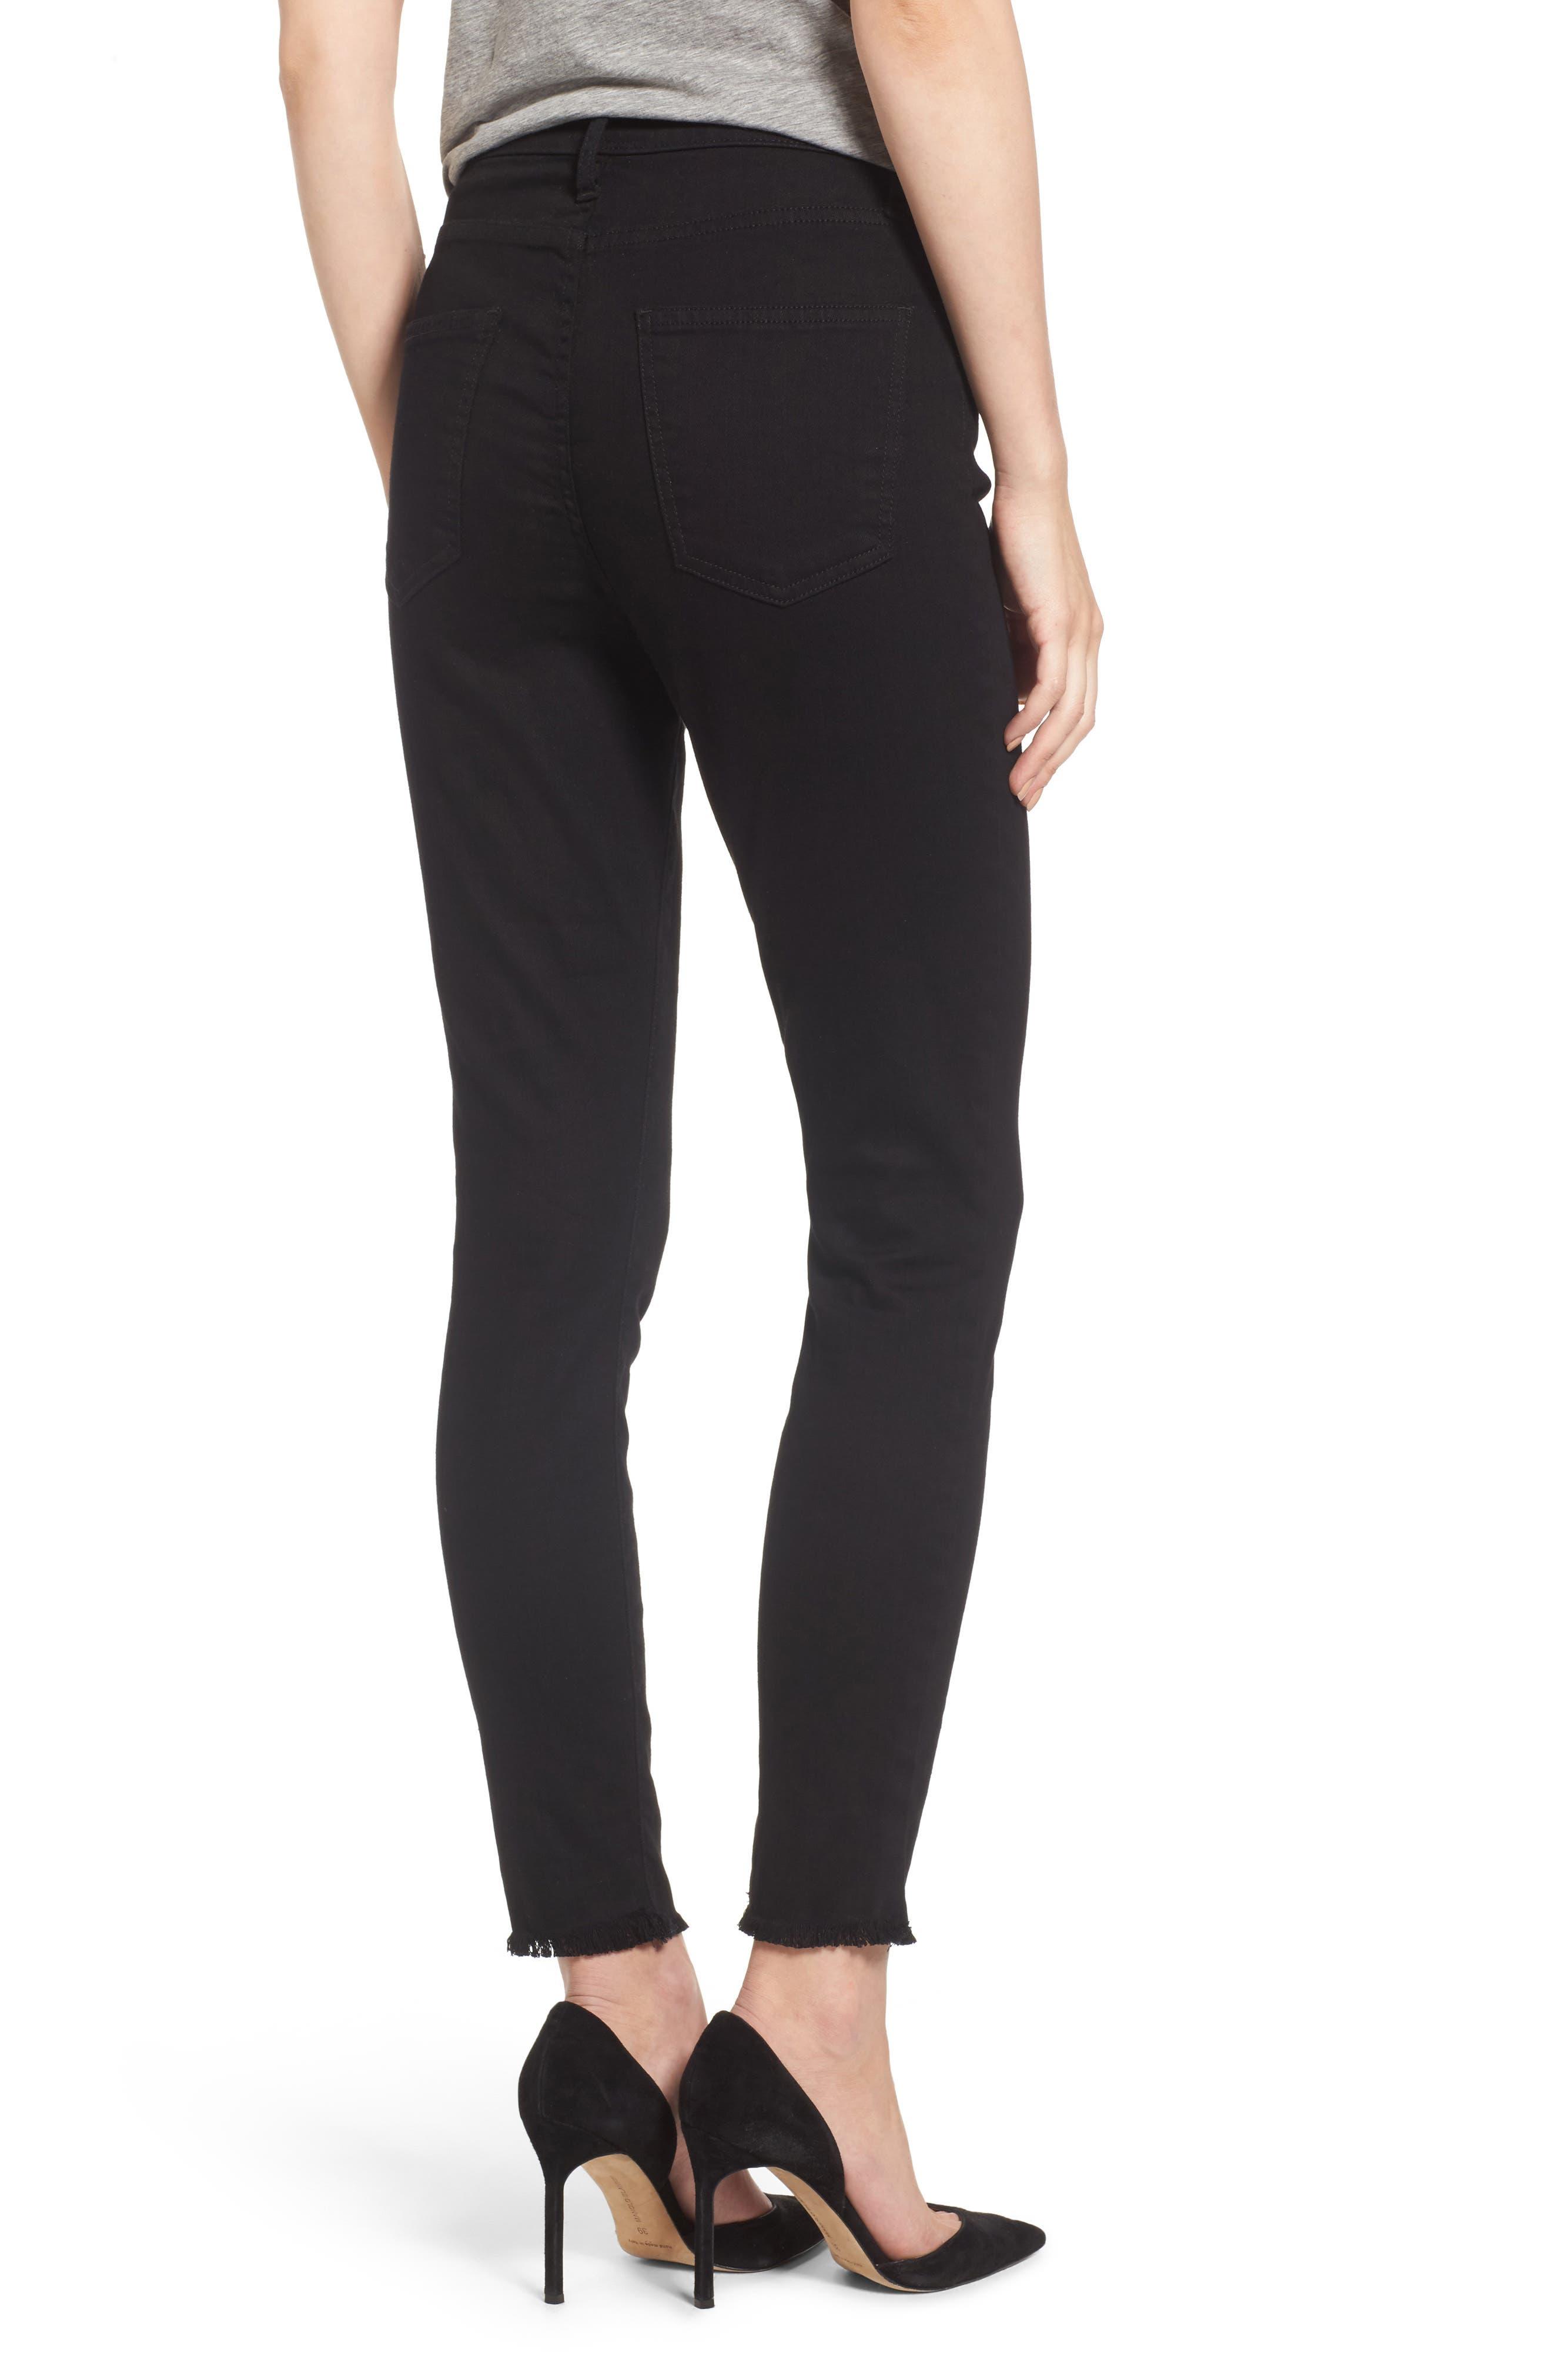 The Super High Waist Stiletto Ankle Skinny Jeans,                             Alternate thumbnail 2, color,                             Jet Black